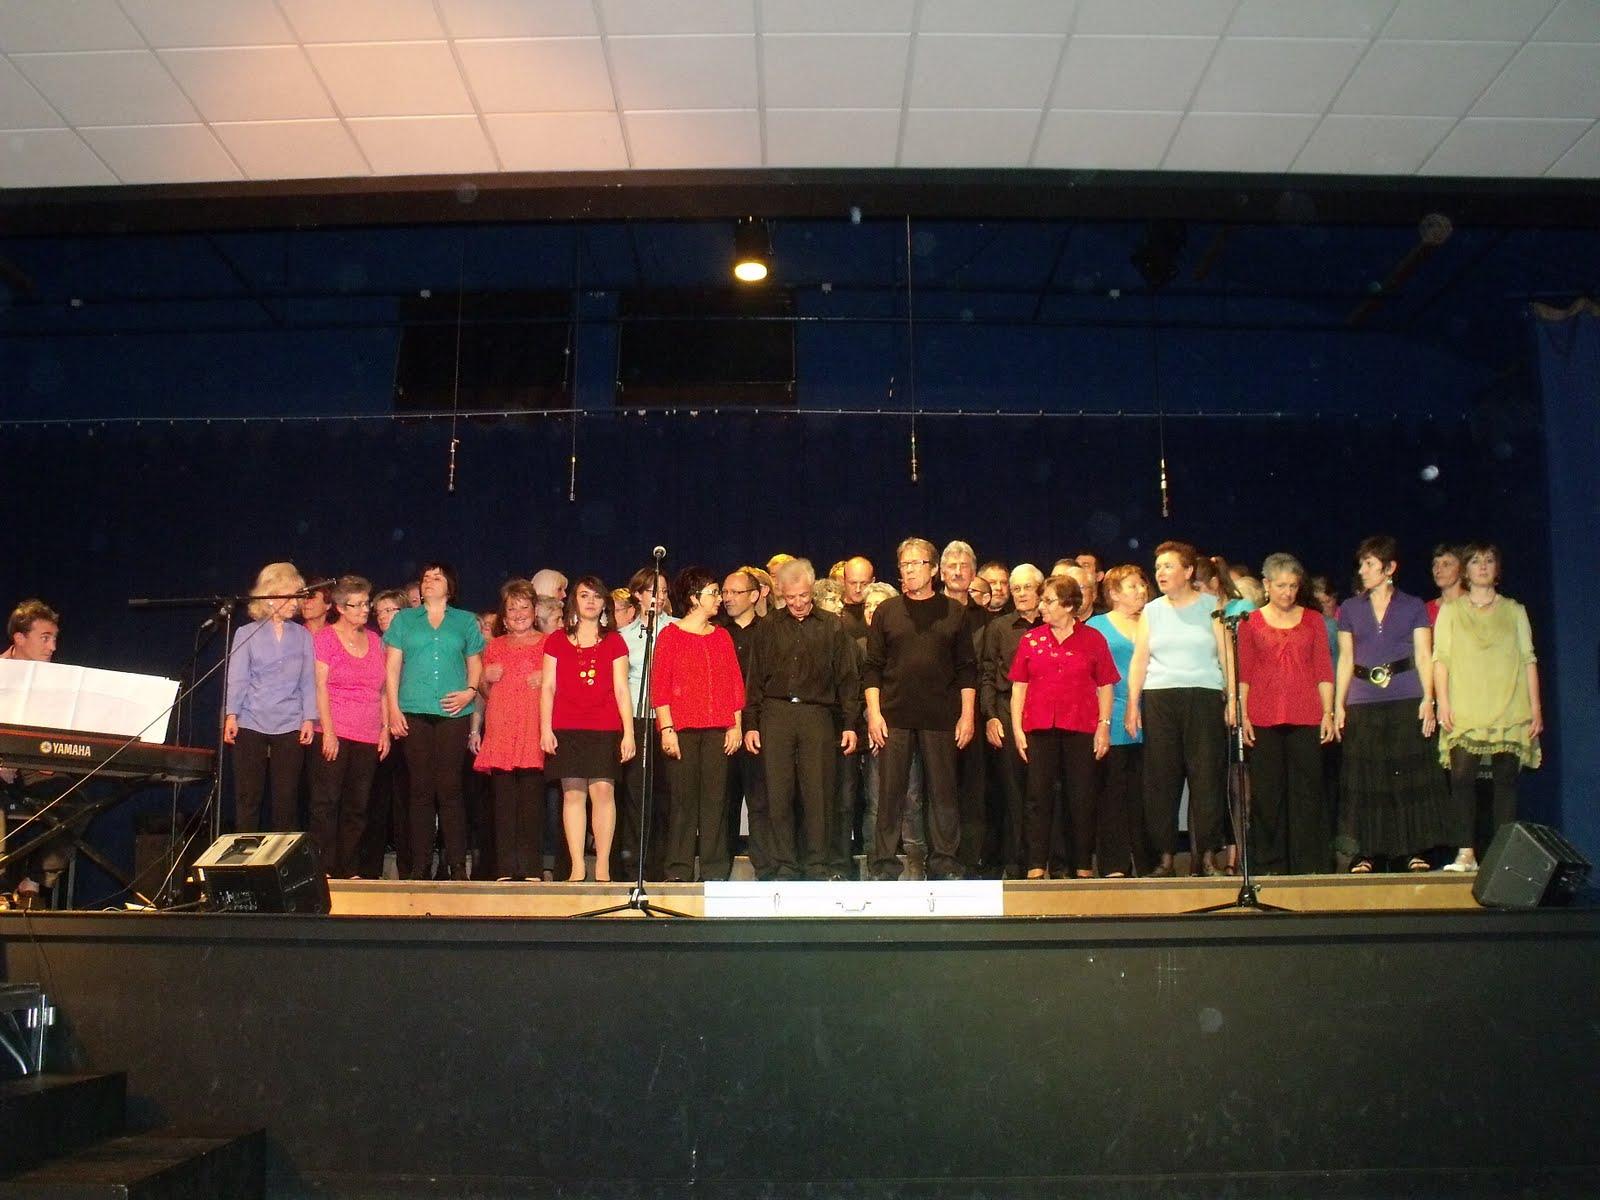 Chorale rencontre esperance